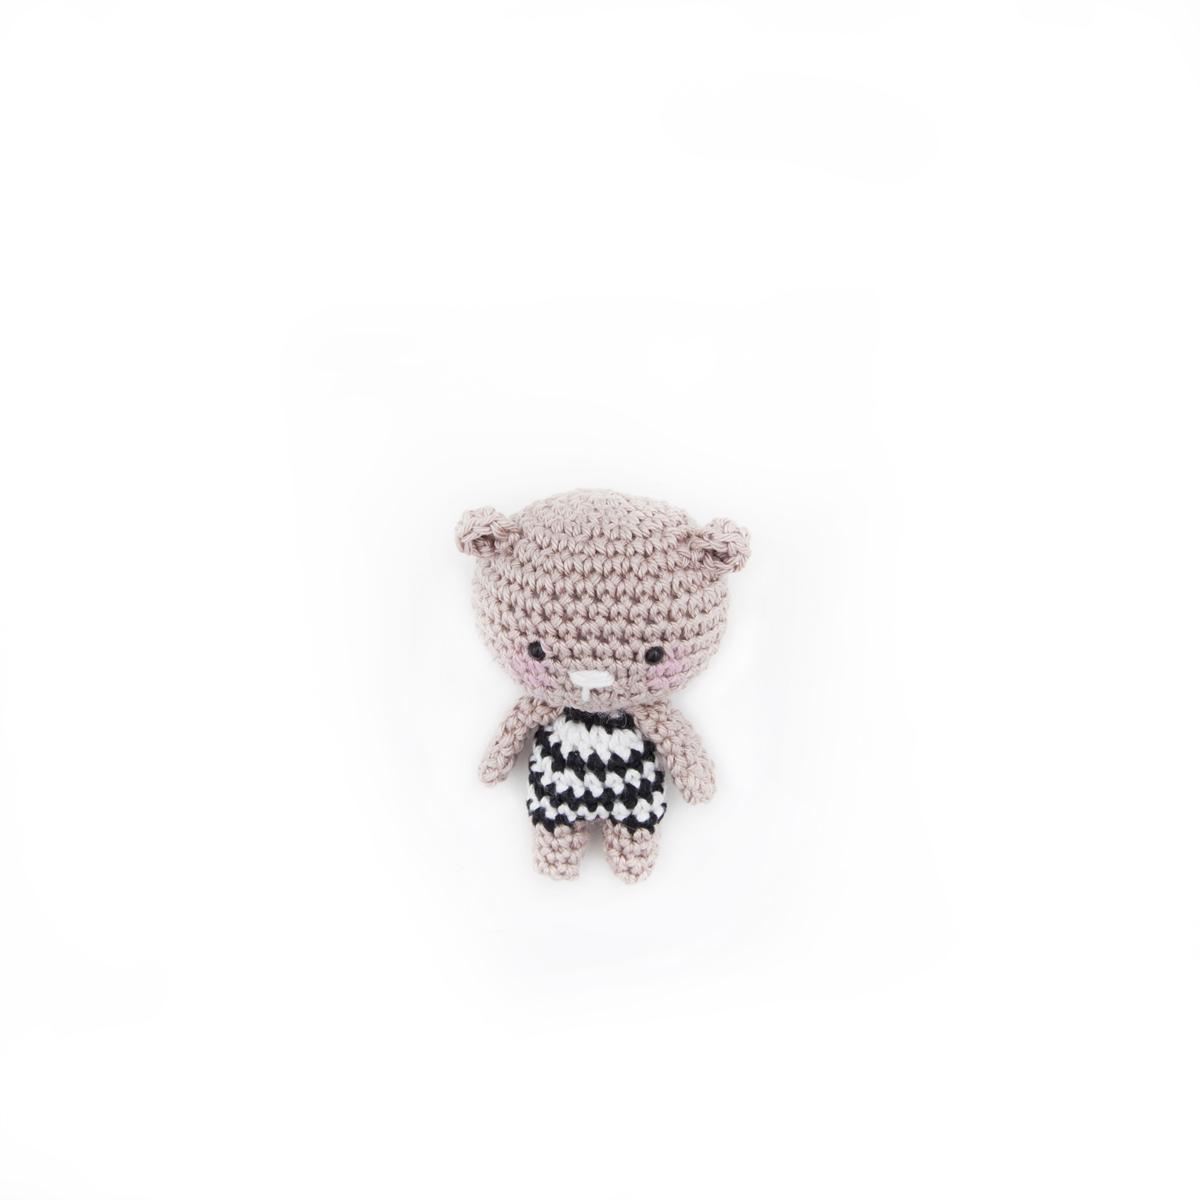 Mini mini teddy bear - Crochet Pattern by Ina Rho